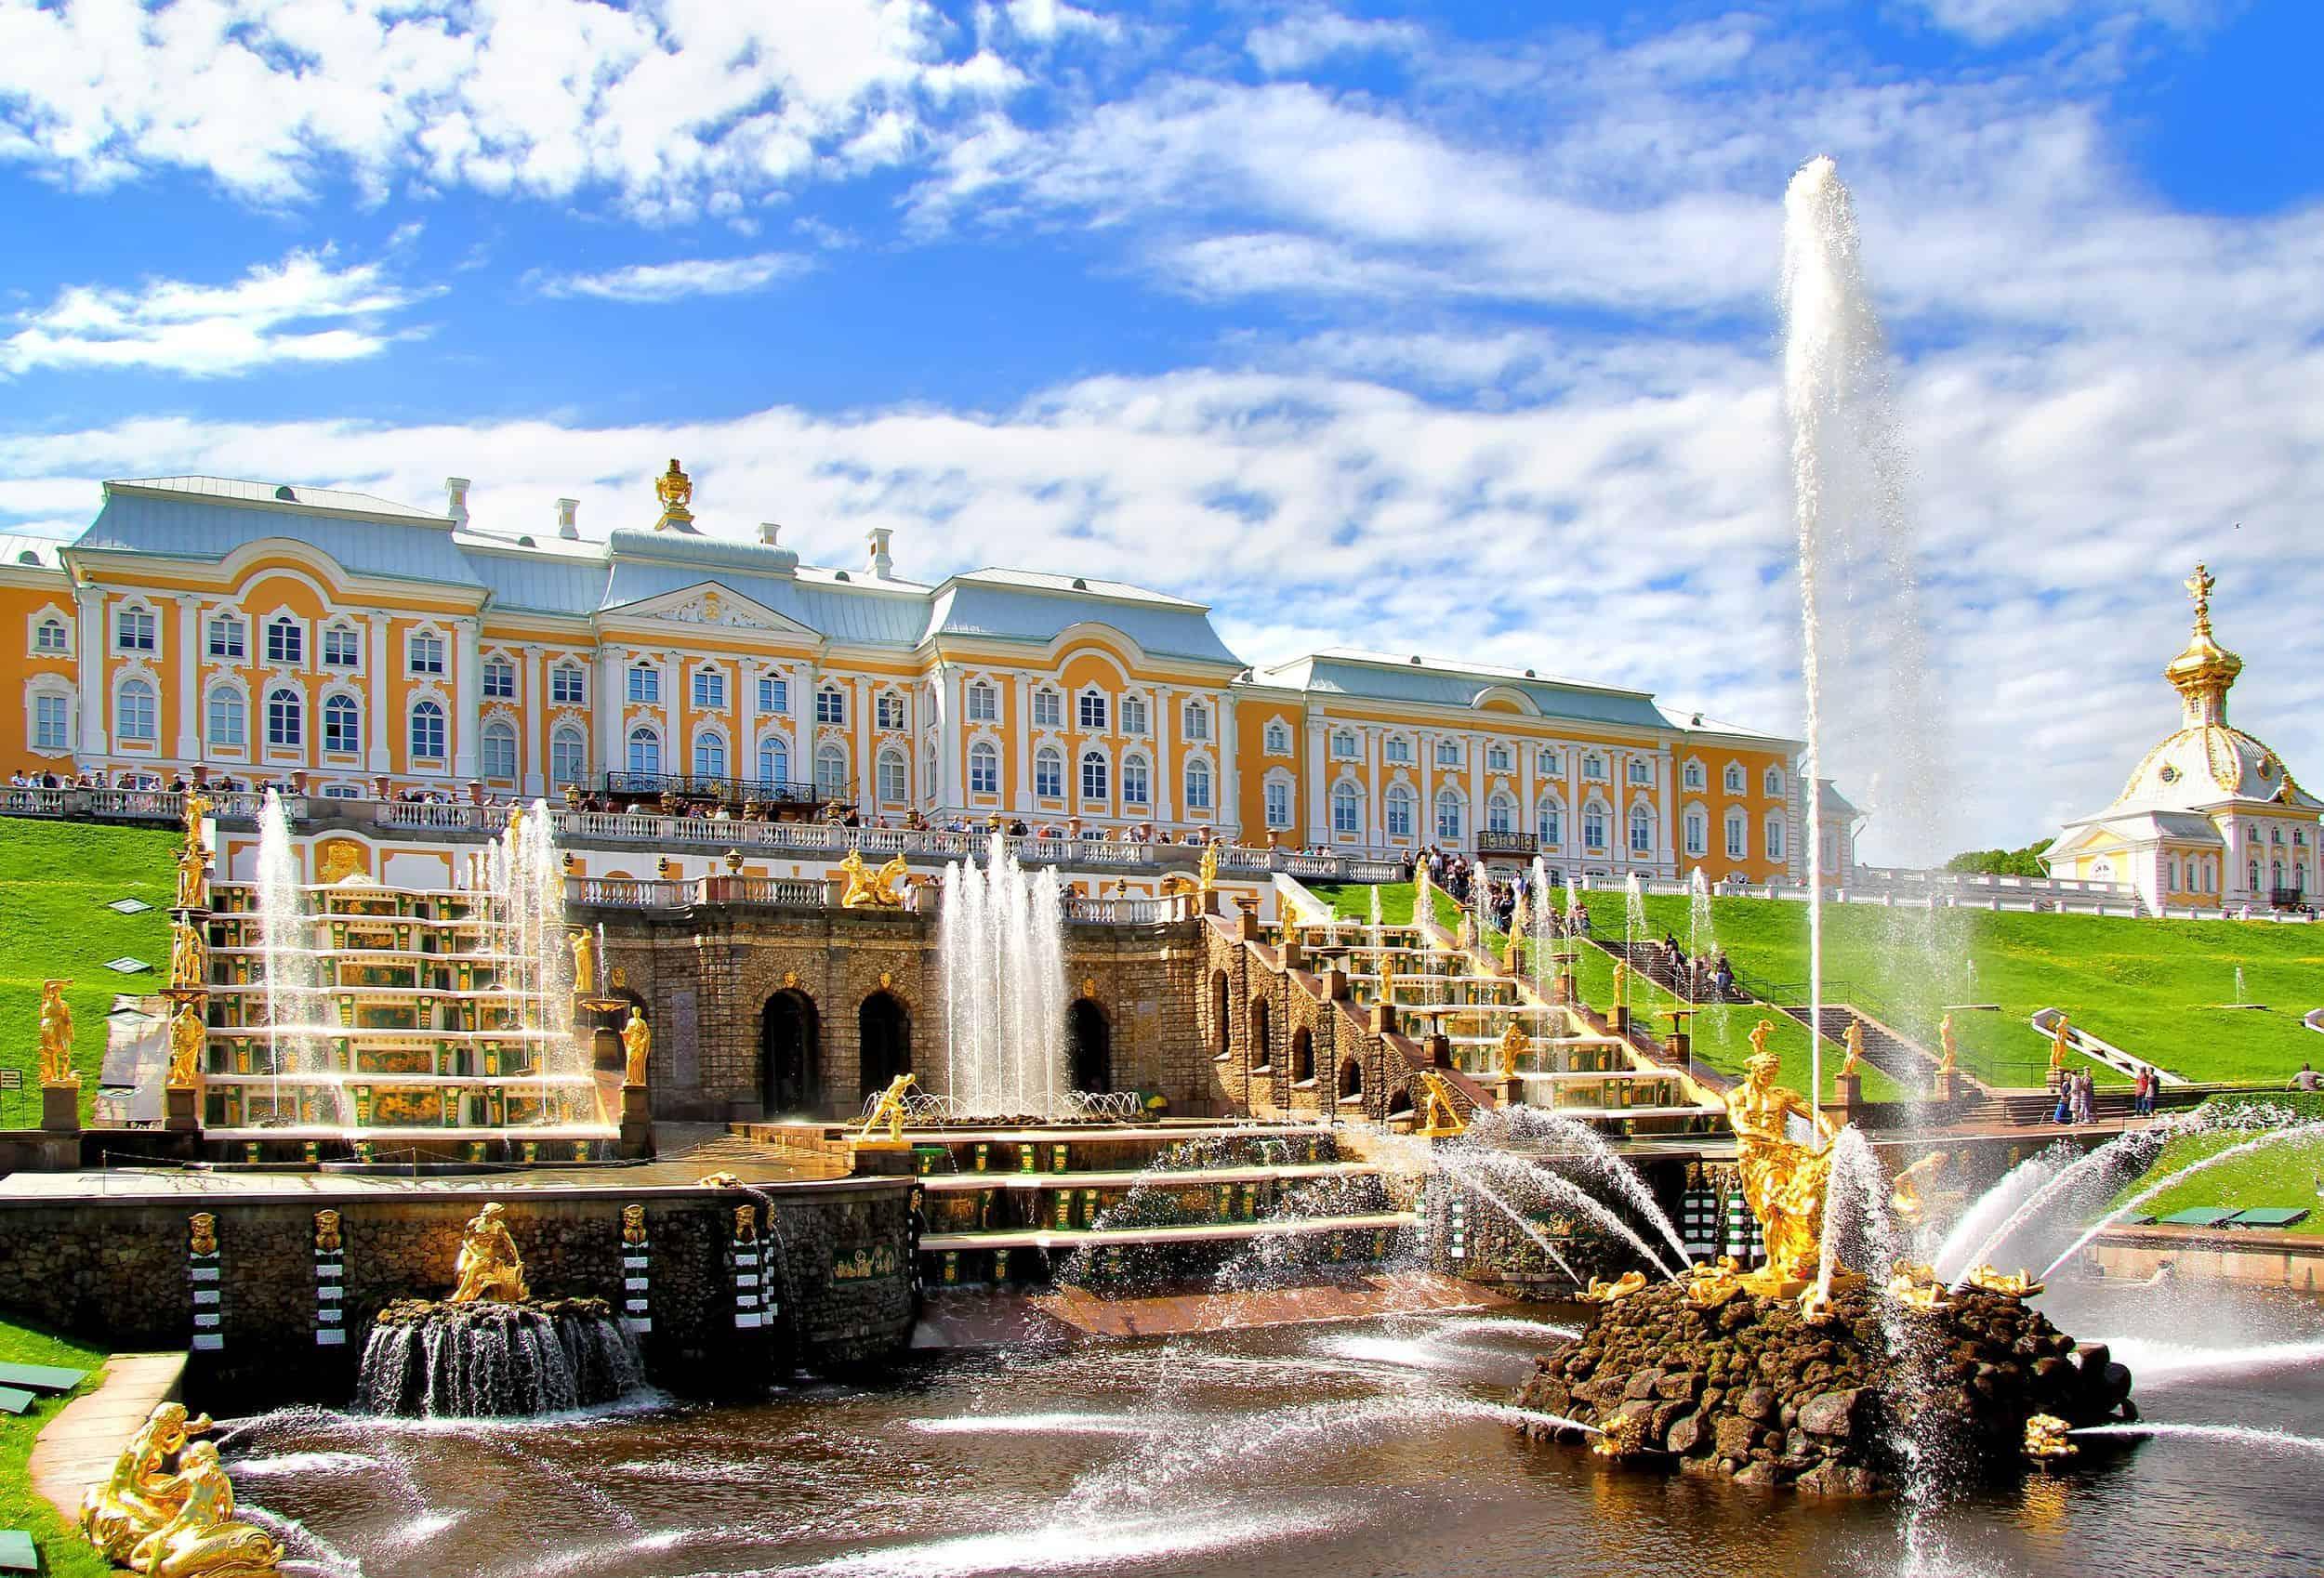 Samson Fountain of the Grand Cascade near Peterhof Palace, Russia